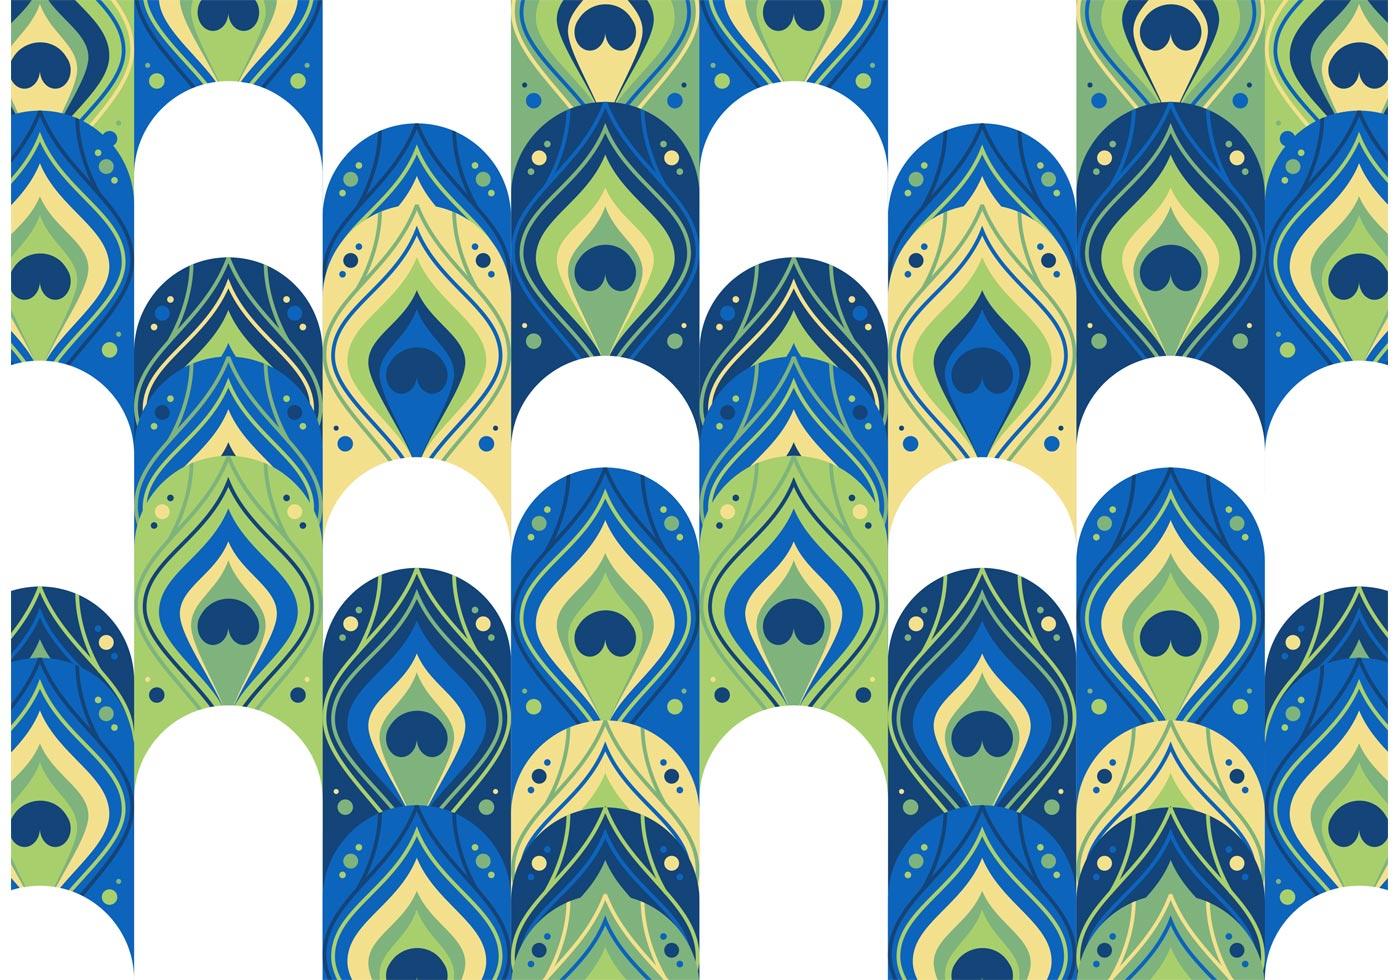 Ganapati Wallpaper 3d Peacock Pattern Free Vector Download Free Vector Art